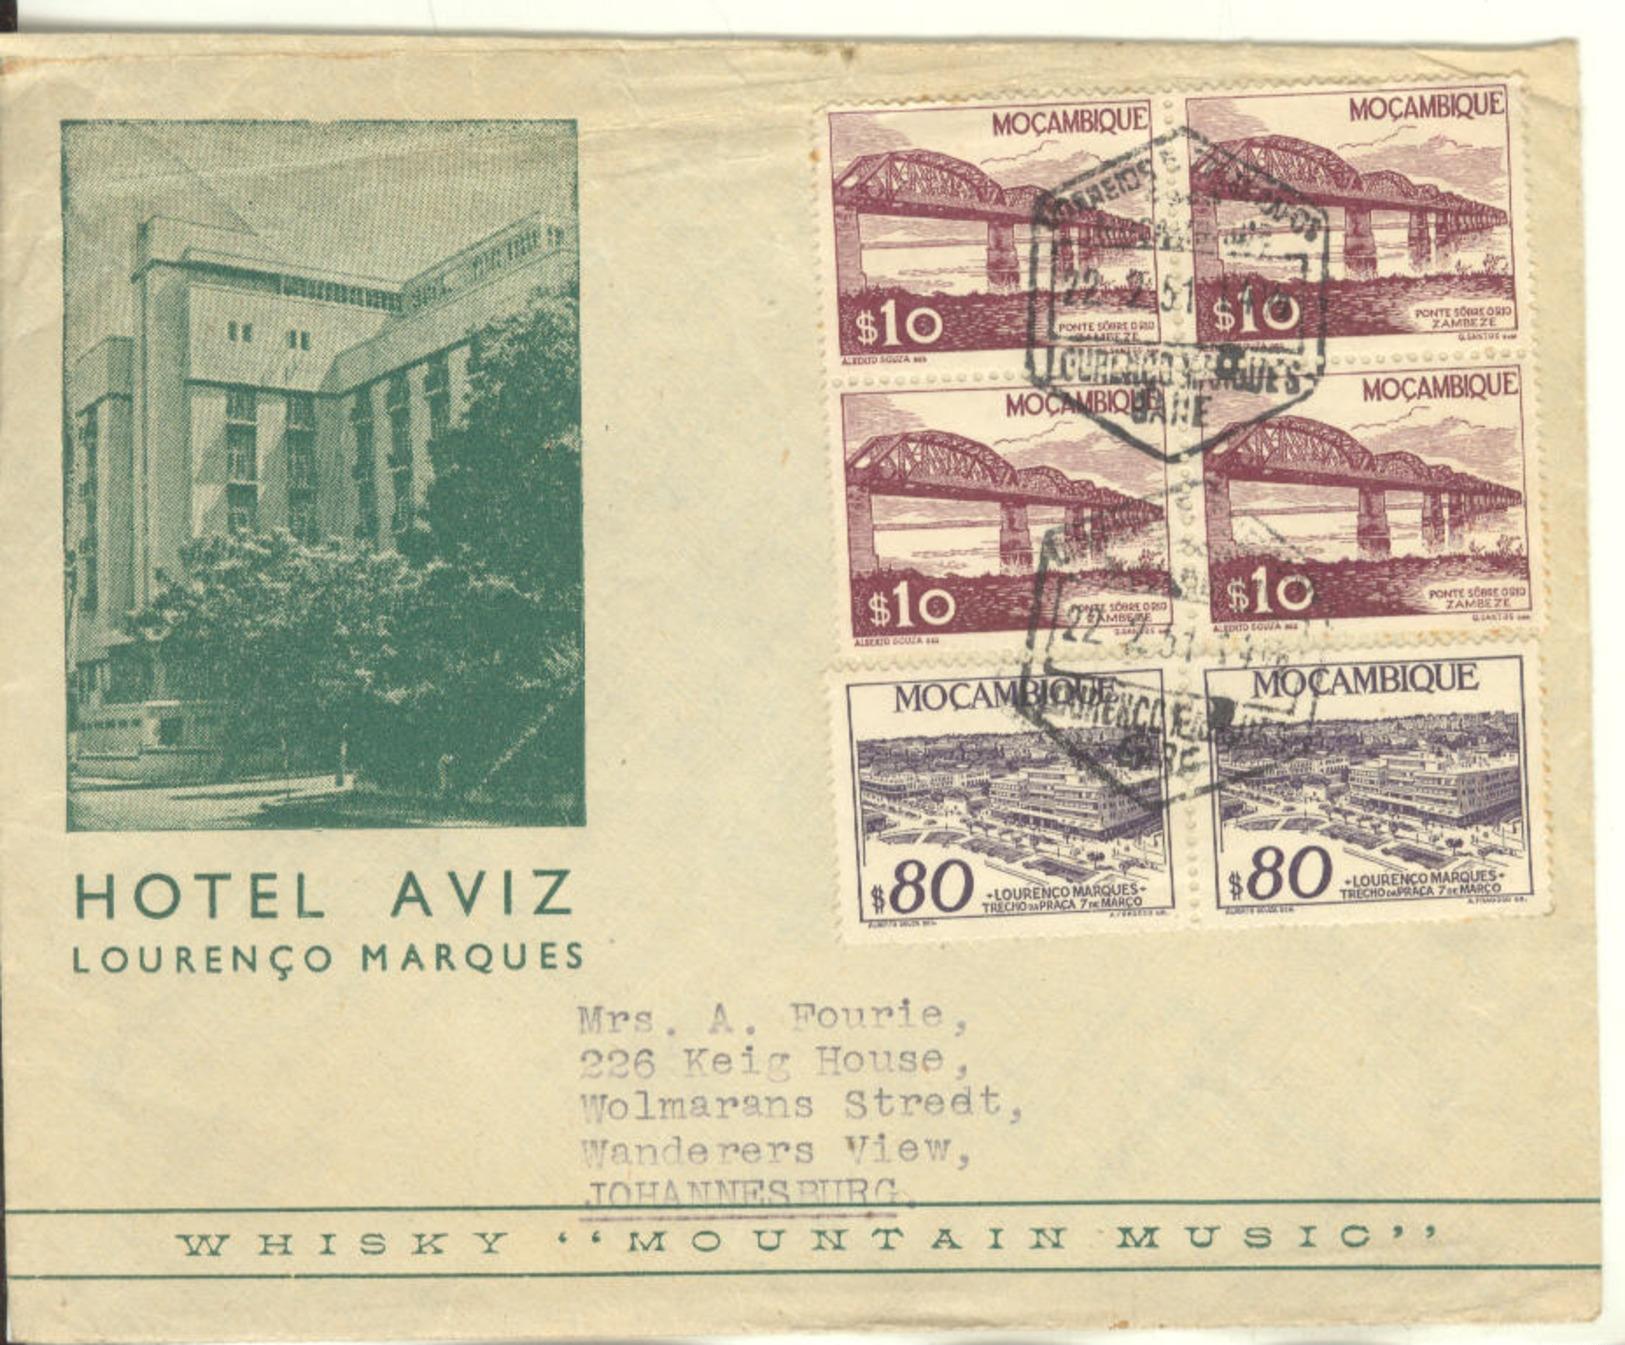 PORTUGAL: COVER HOTEL AVIZ To JHB - Mozambique